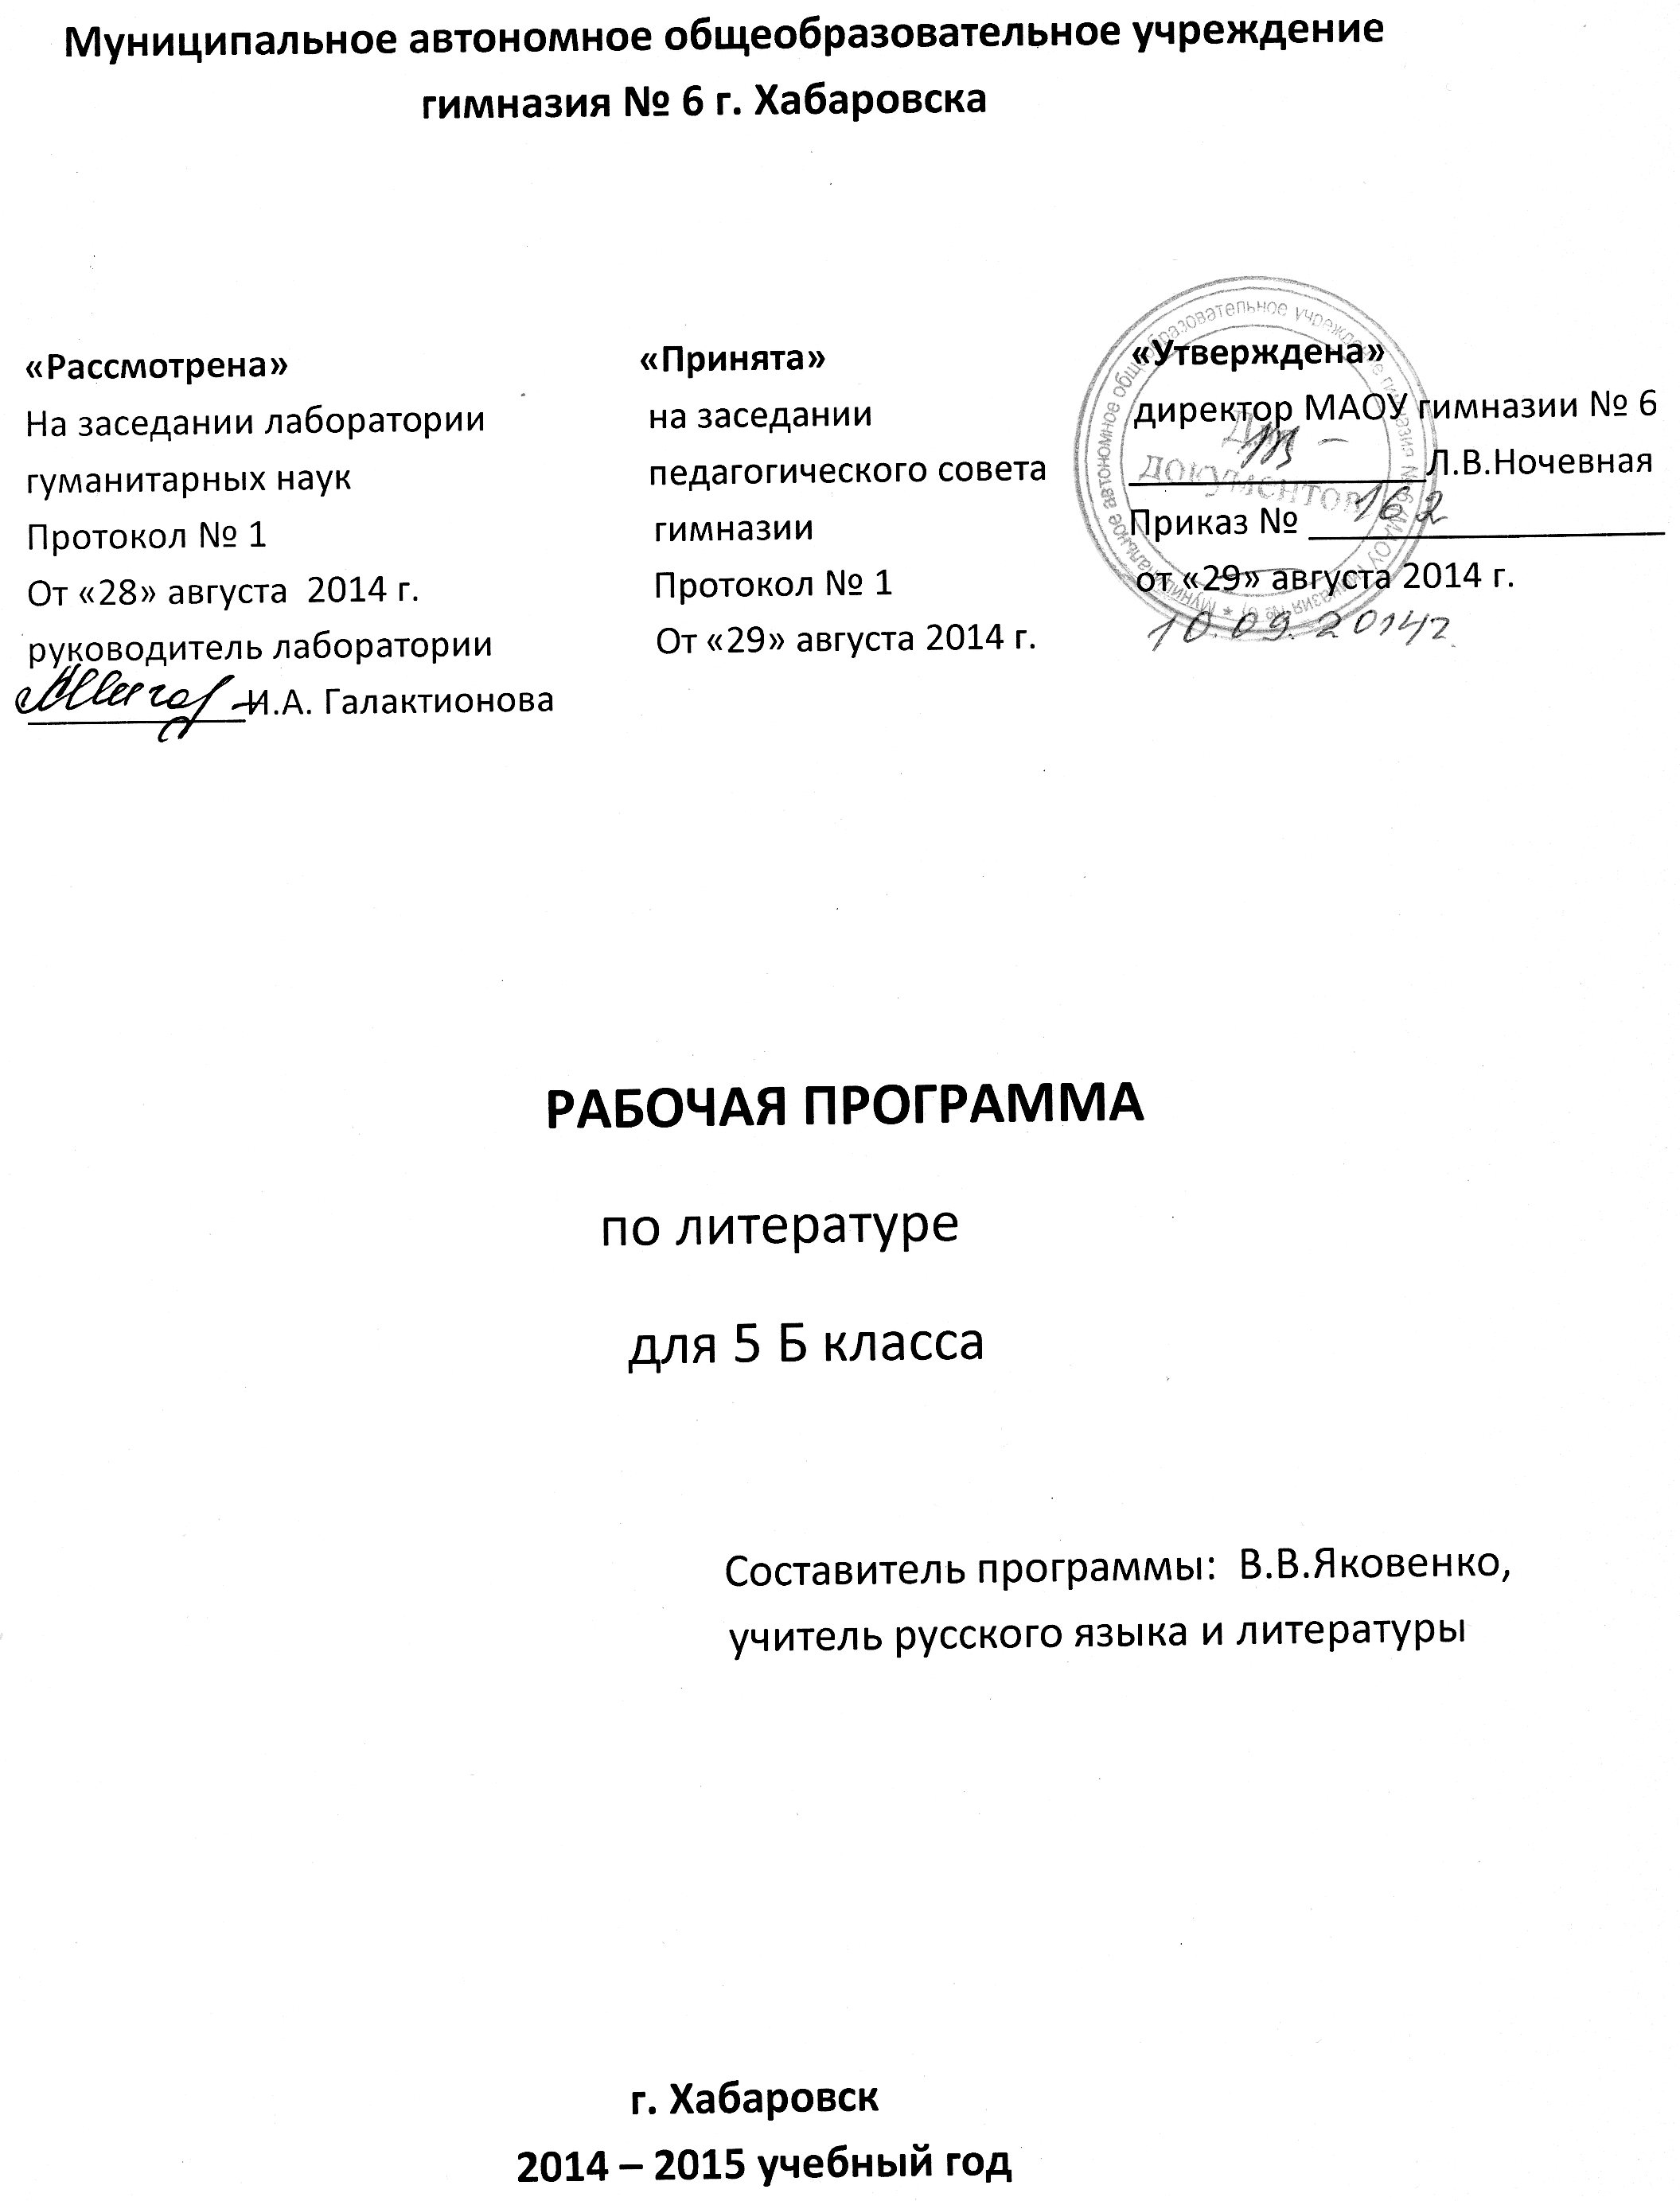 G:\Рабочие программы Яковенко ВВ\img374.jpg